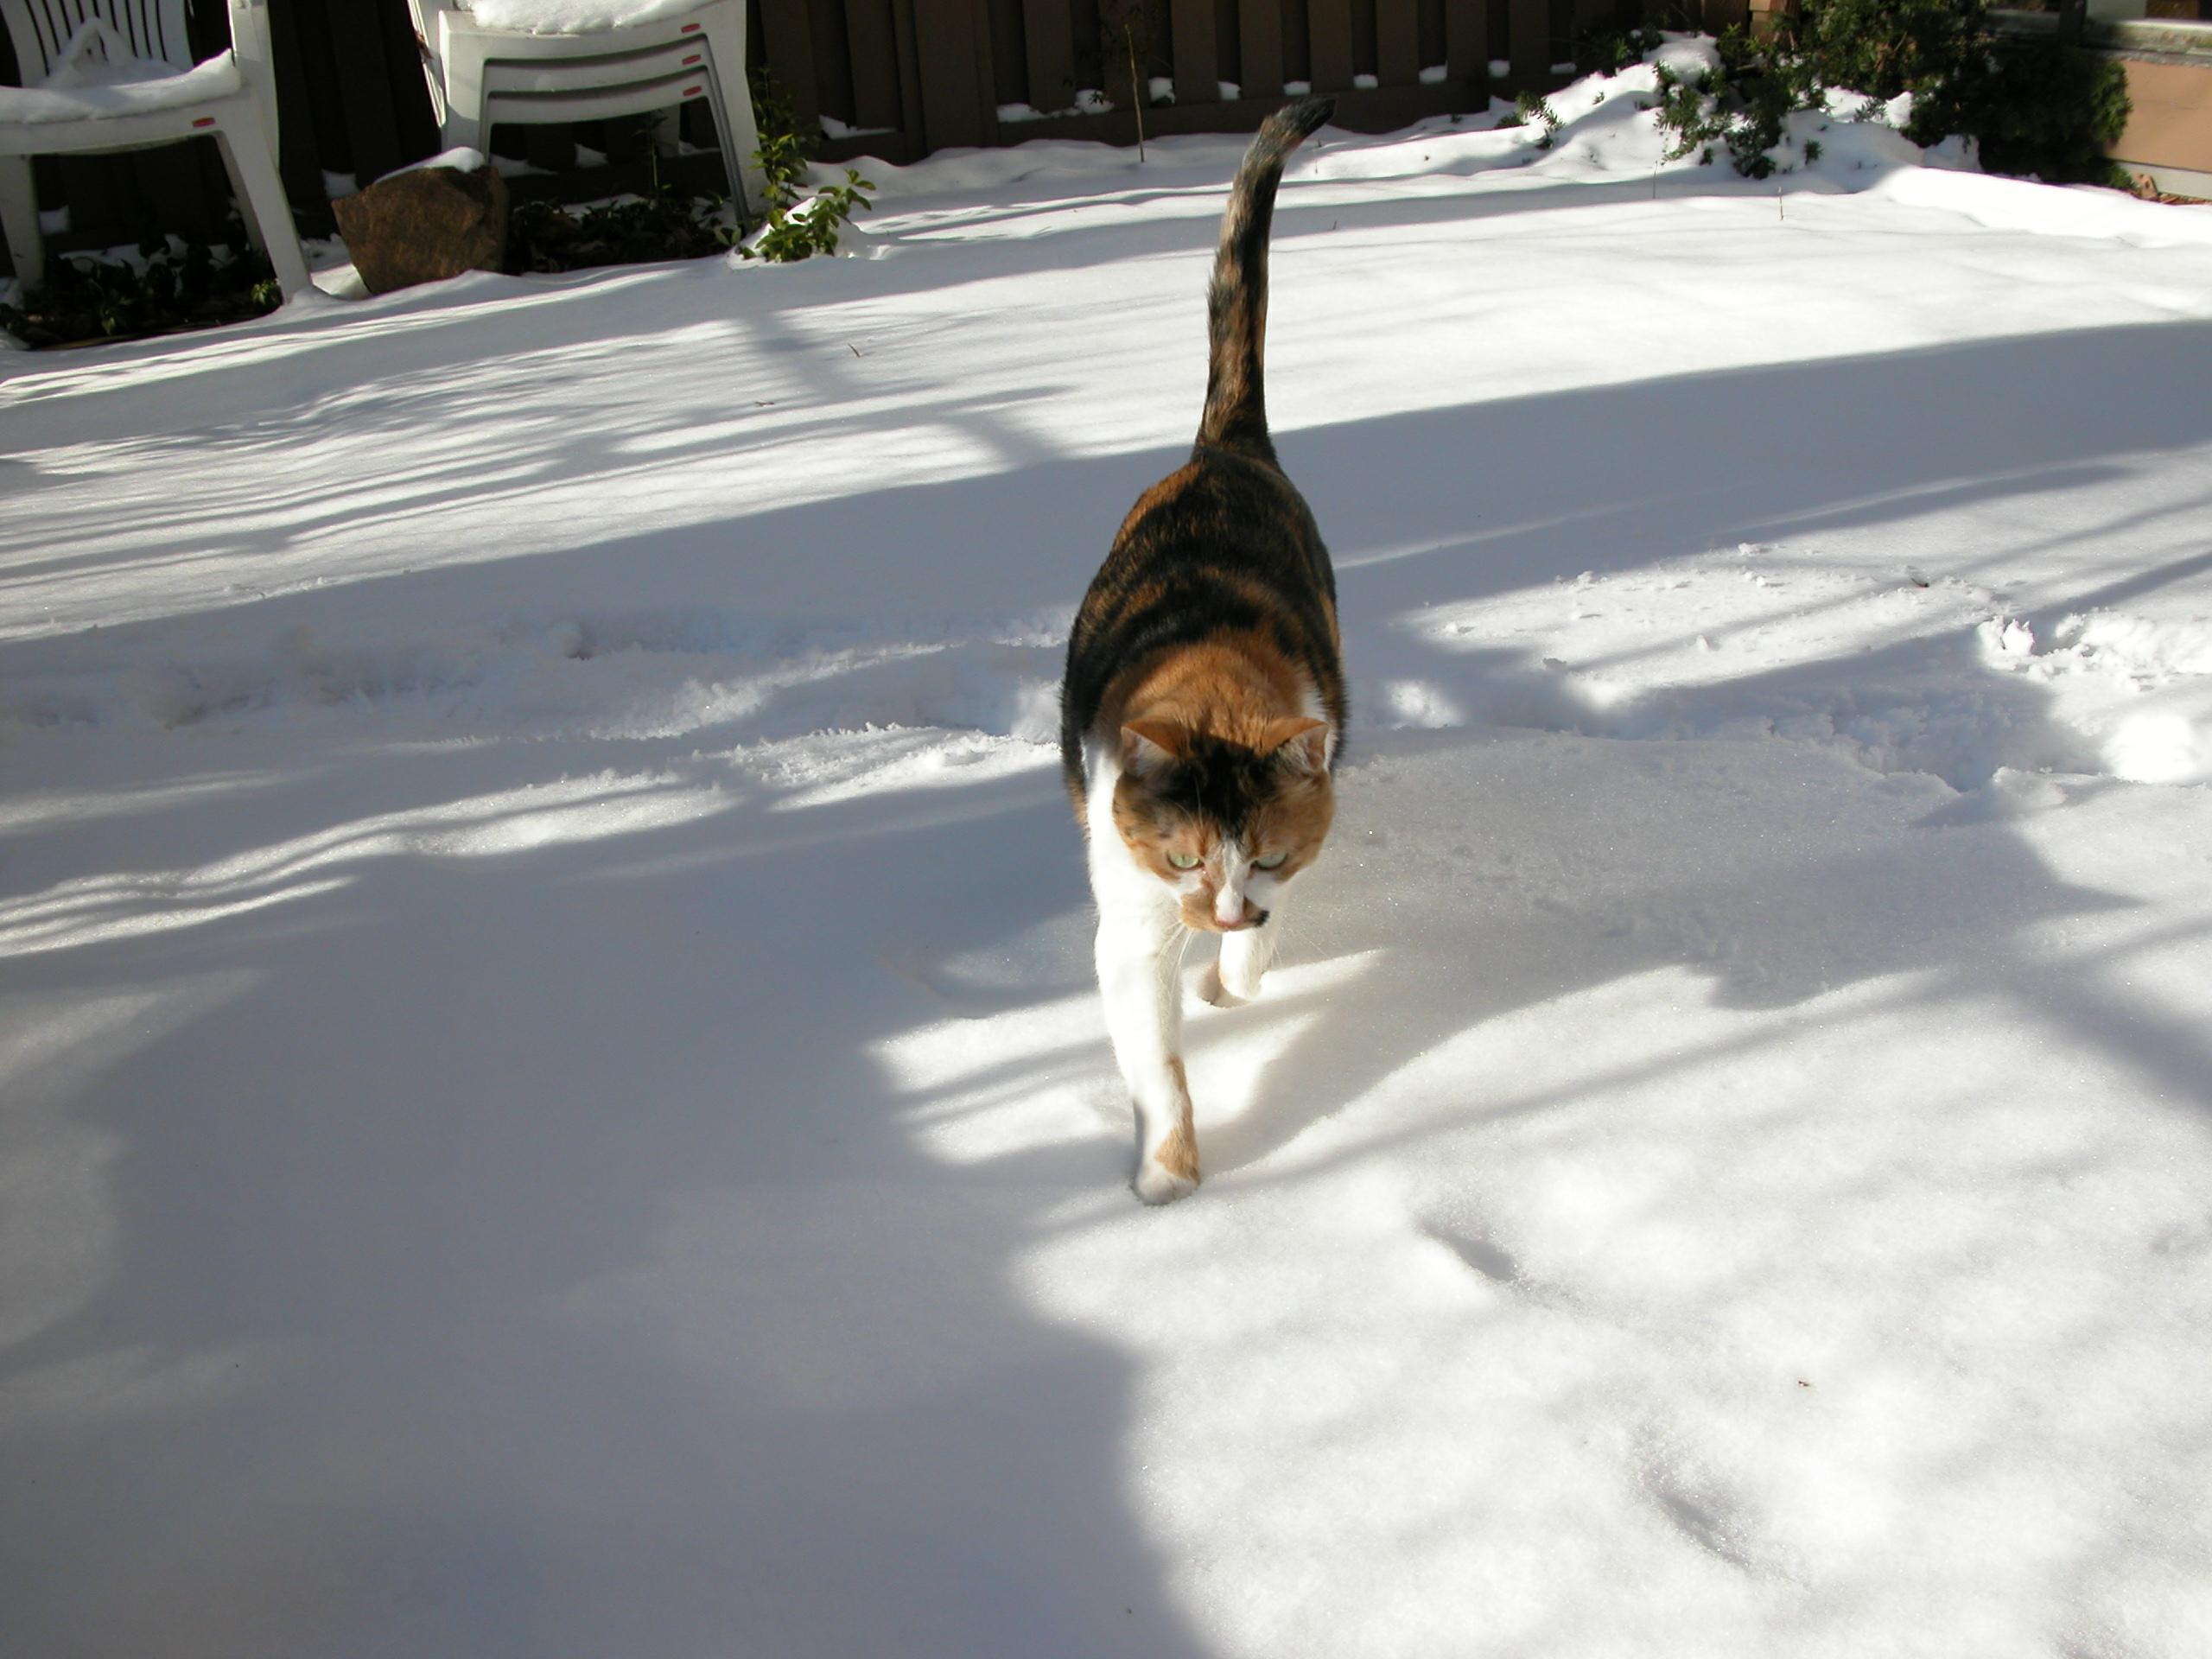 02092003DSCN2091 Tess Heder's Calico Queen Cat